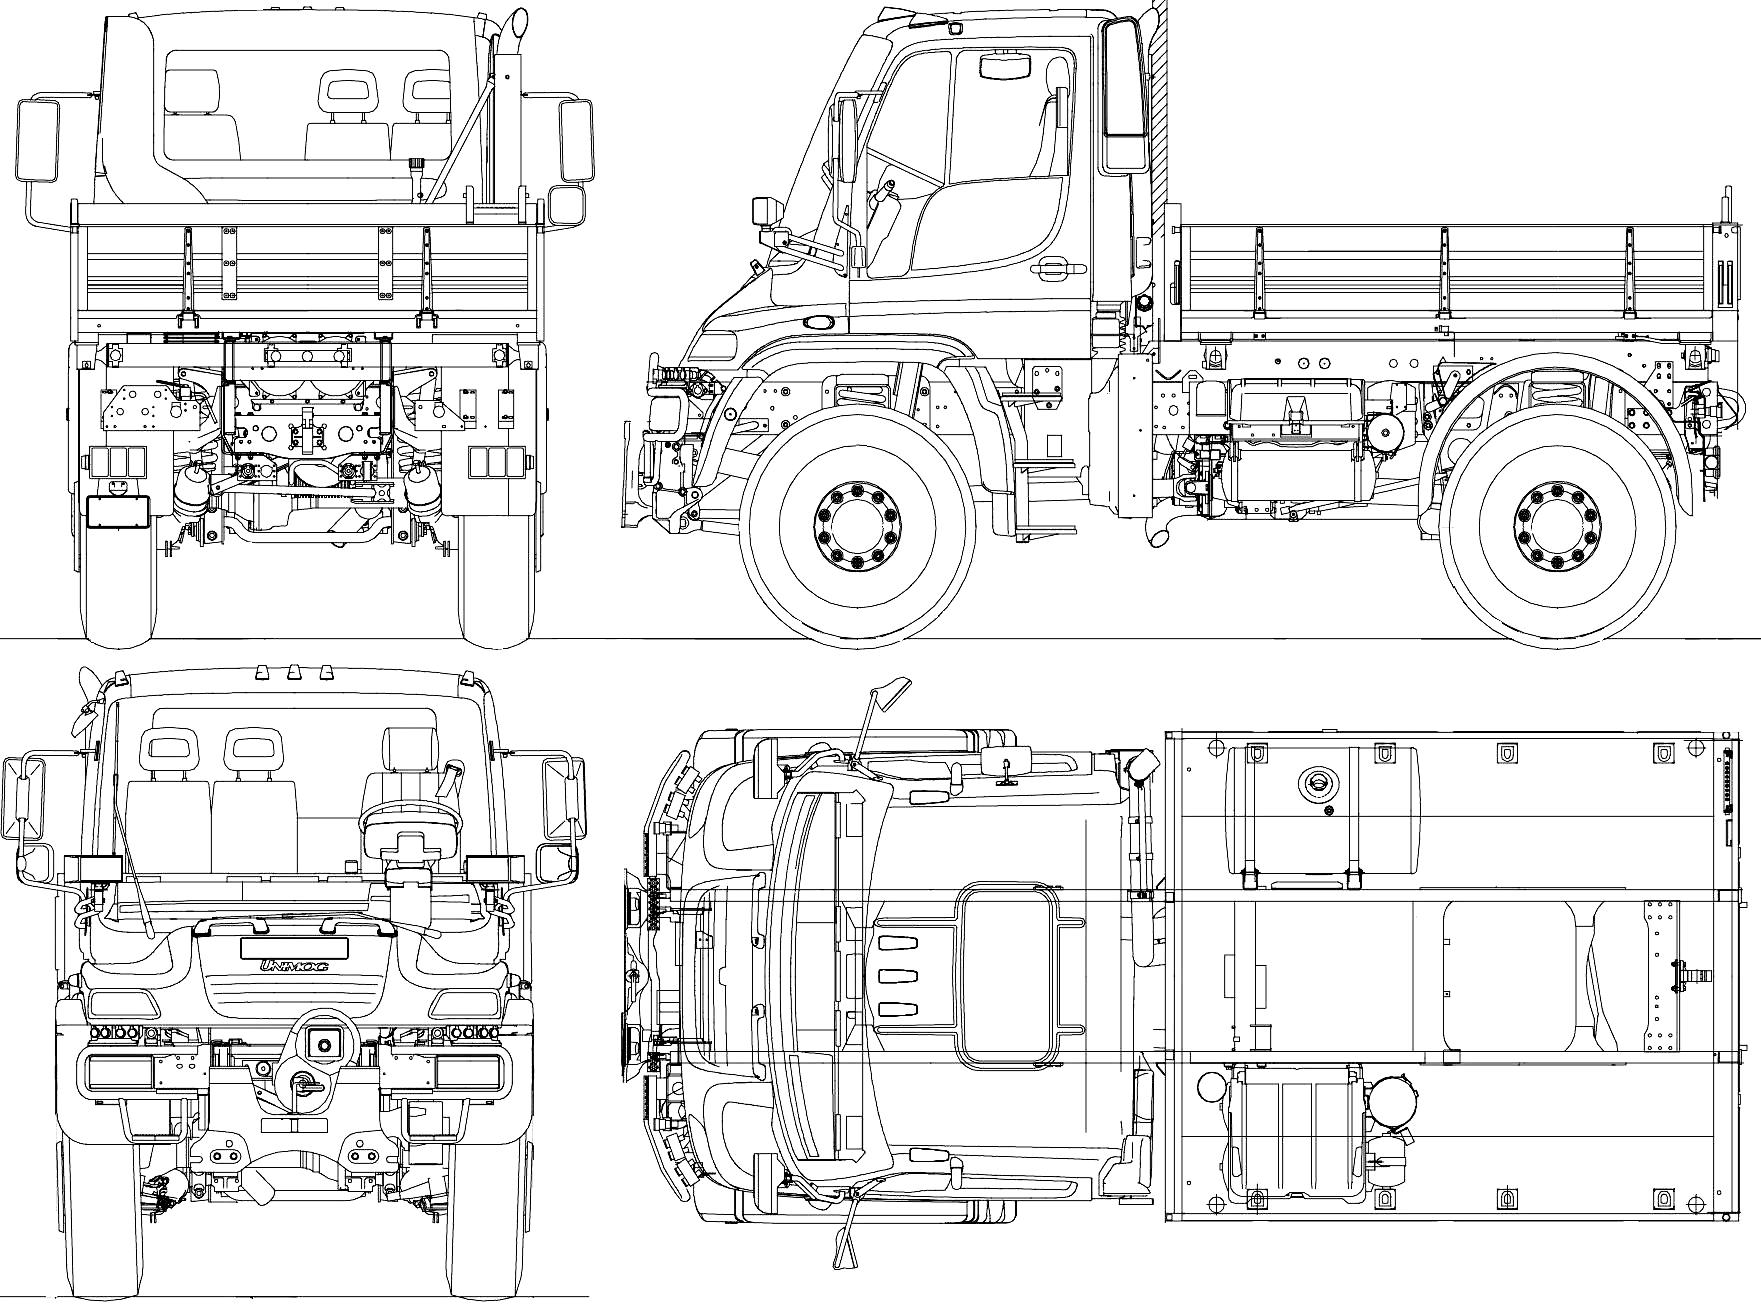 unimog coloring pages | Unimog U500 drawing | Mercedes benz unimog, Mercedes benz ...